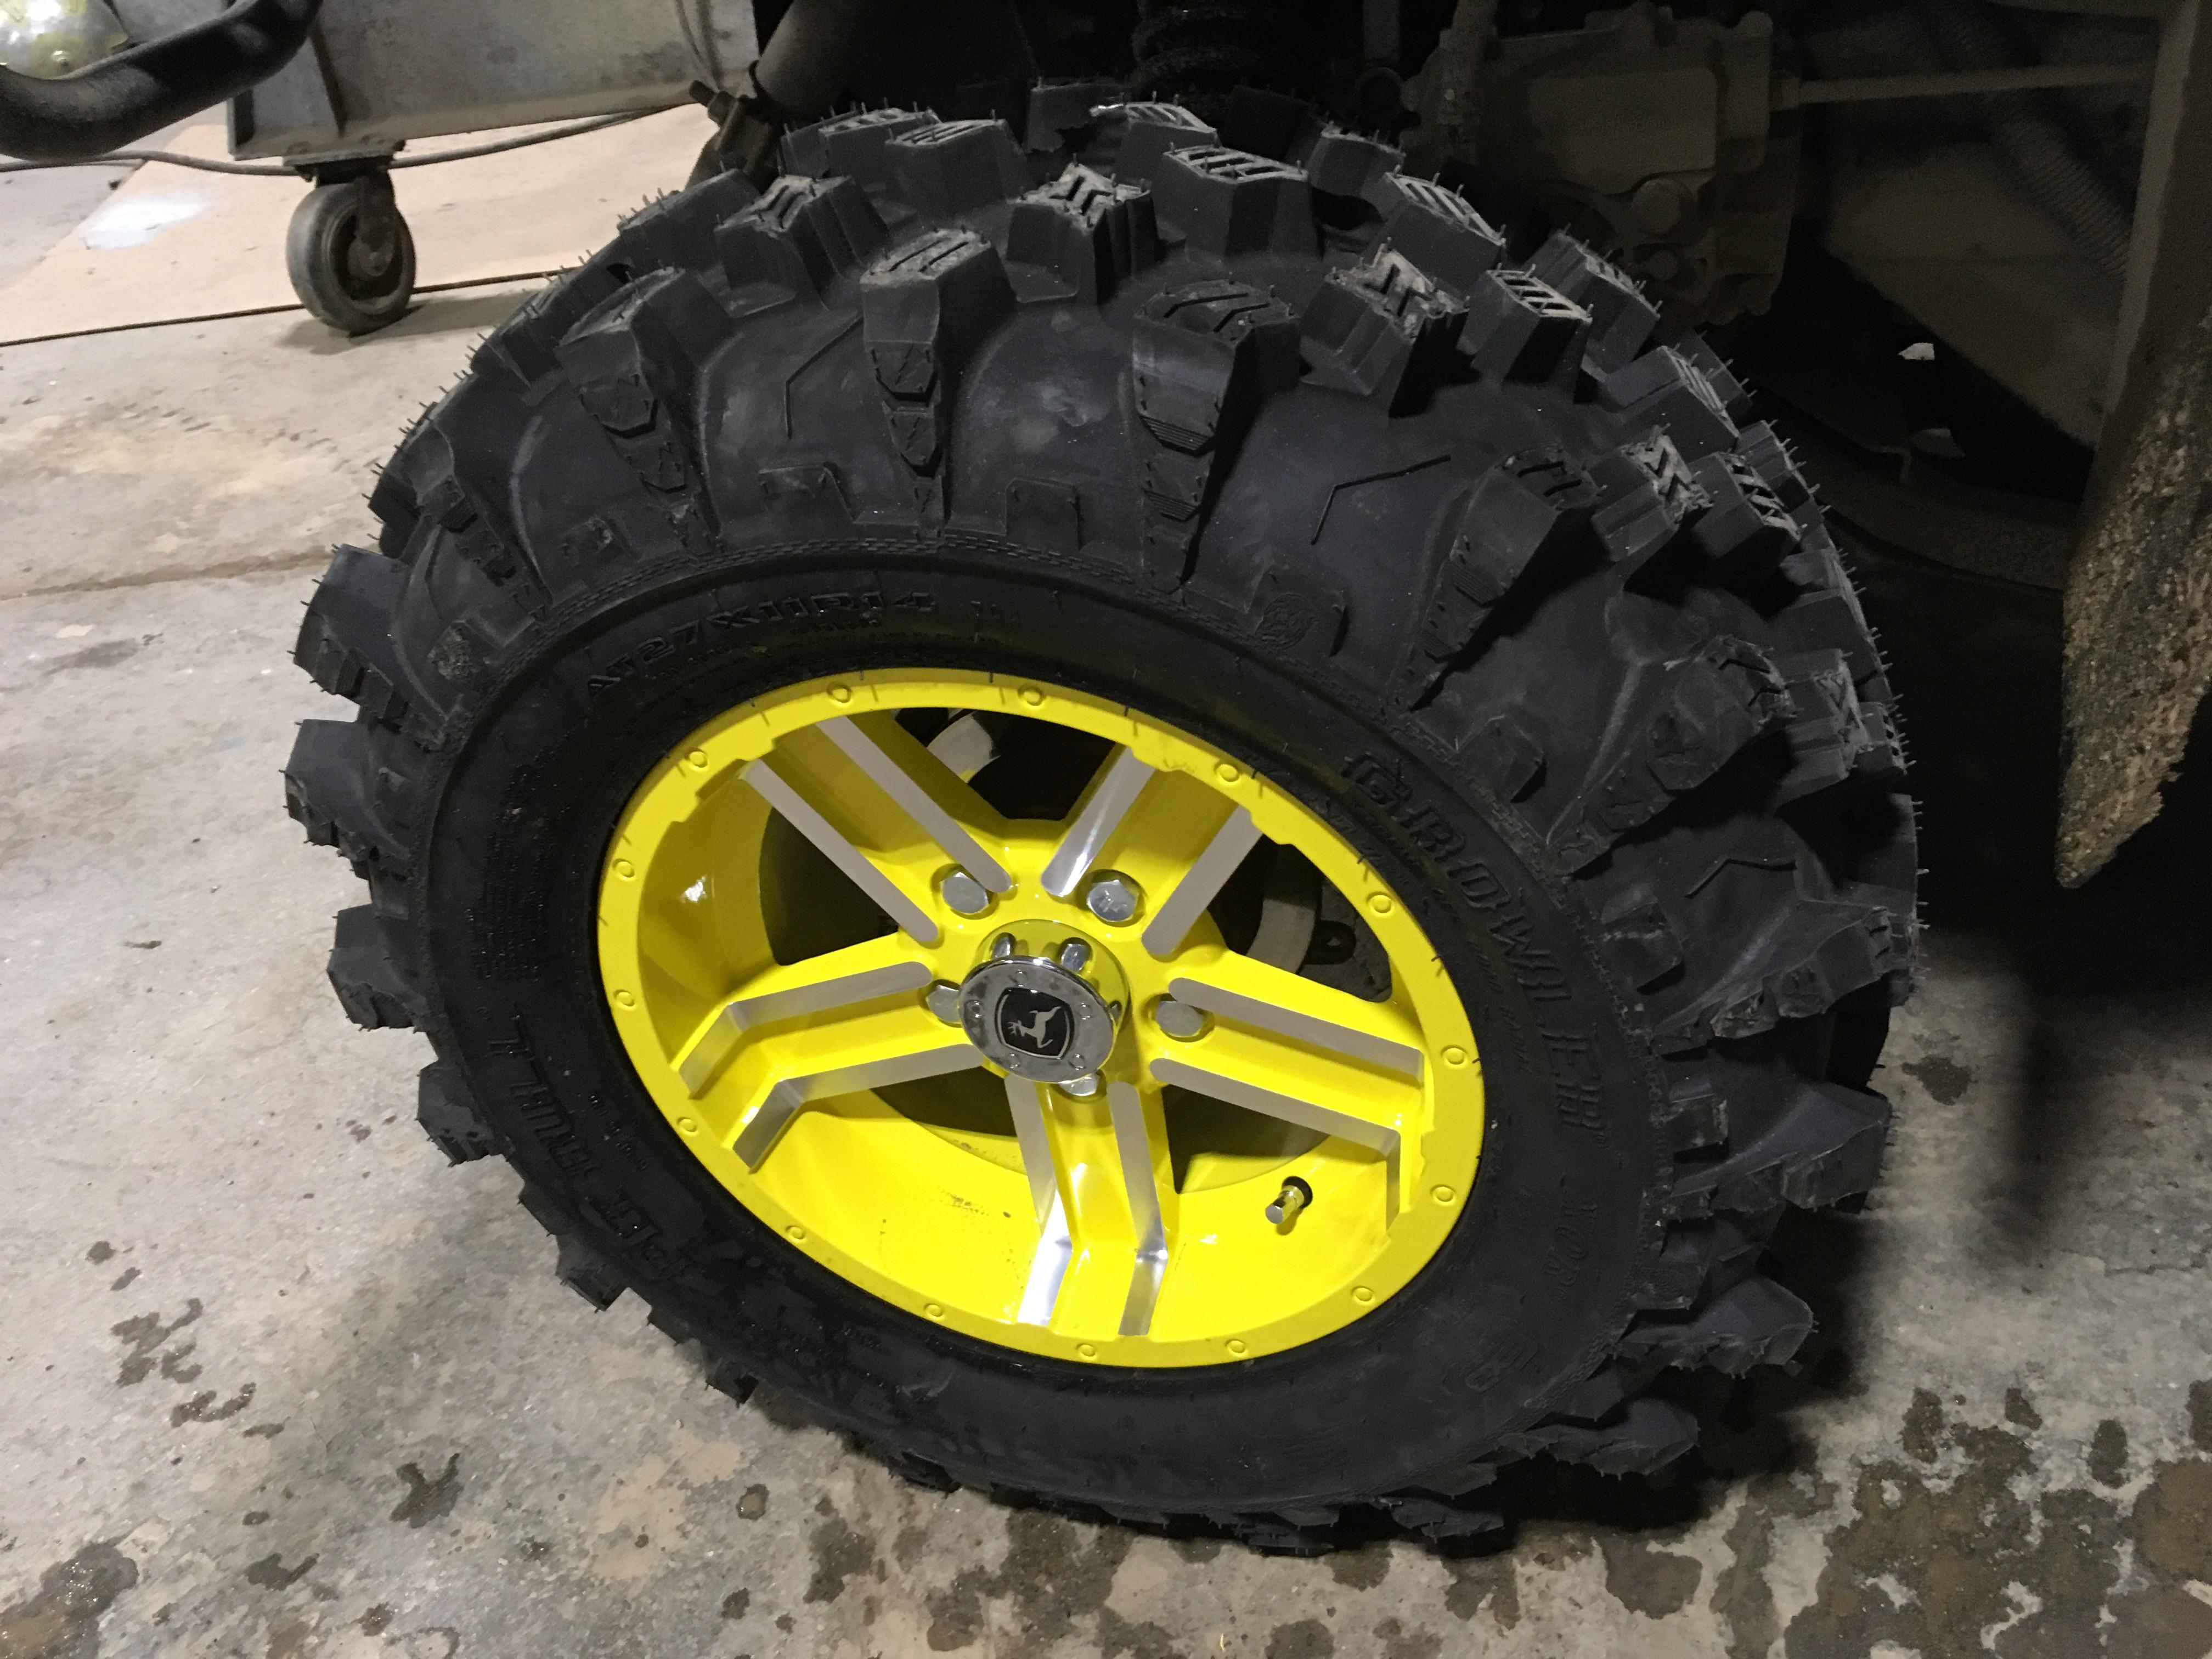 John Deere Wheels And Rims : New wheels and tires john deere gator forums